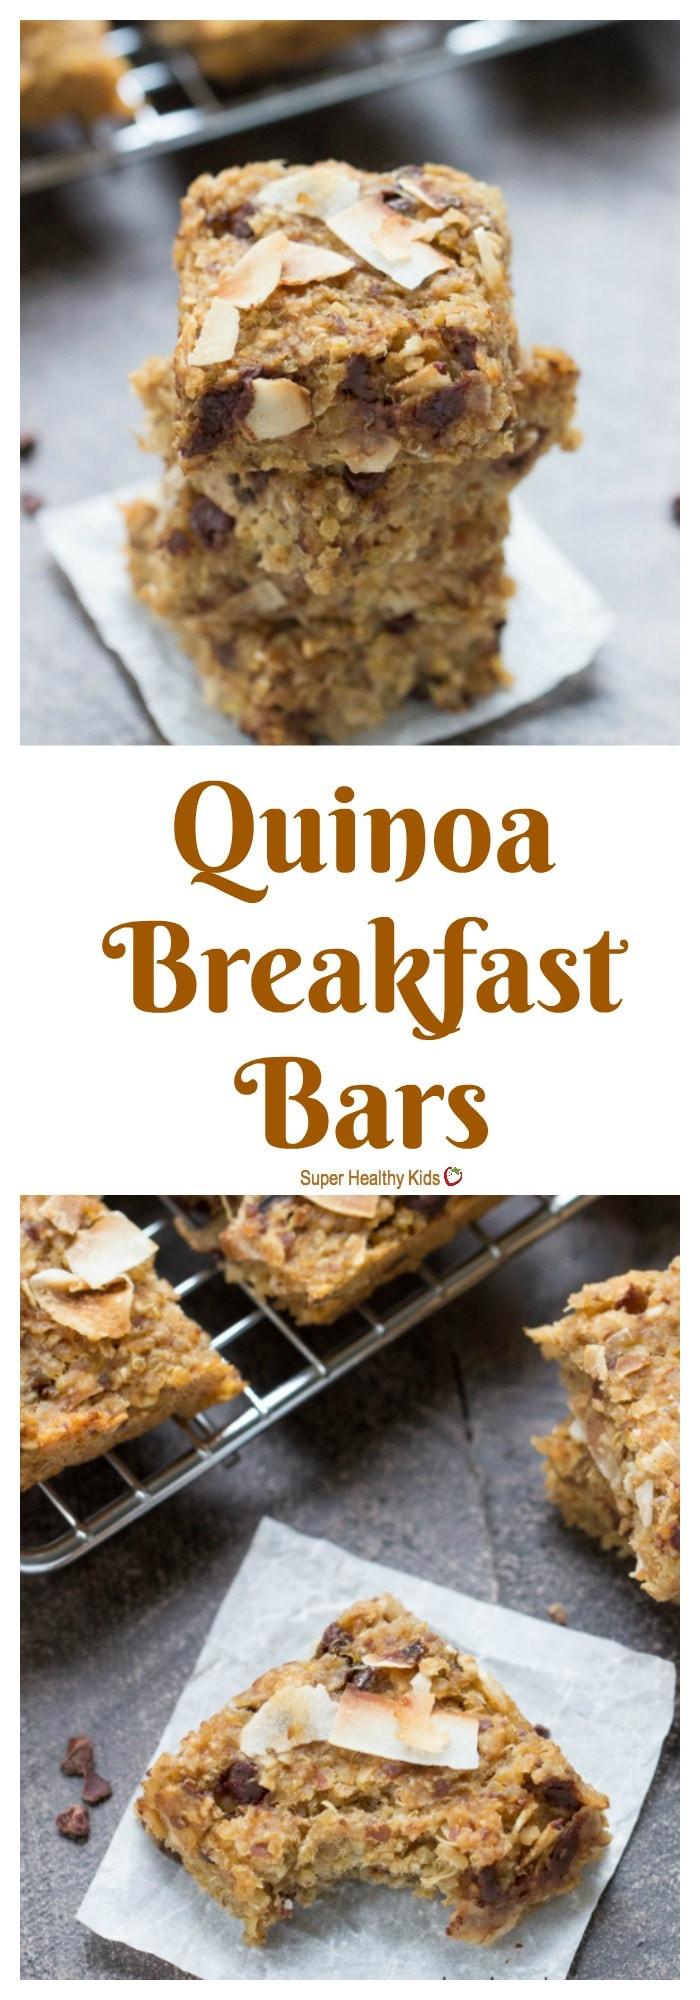 Healthy On The Go Breakfast Bars  Simple Quinoa Breakfast Bars